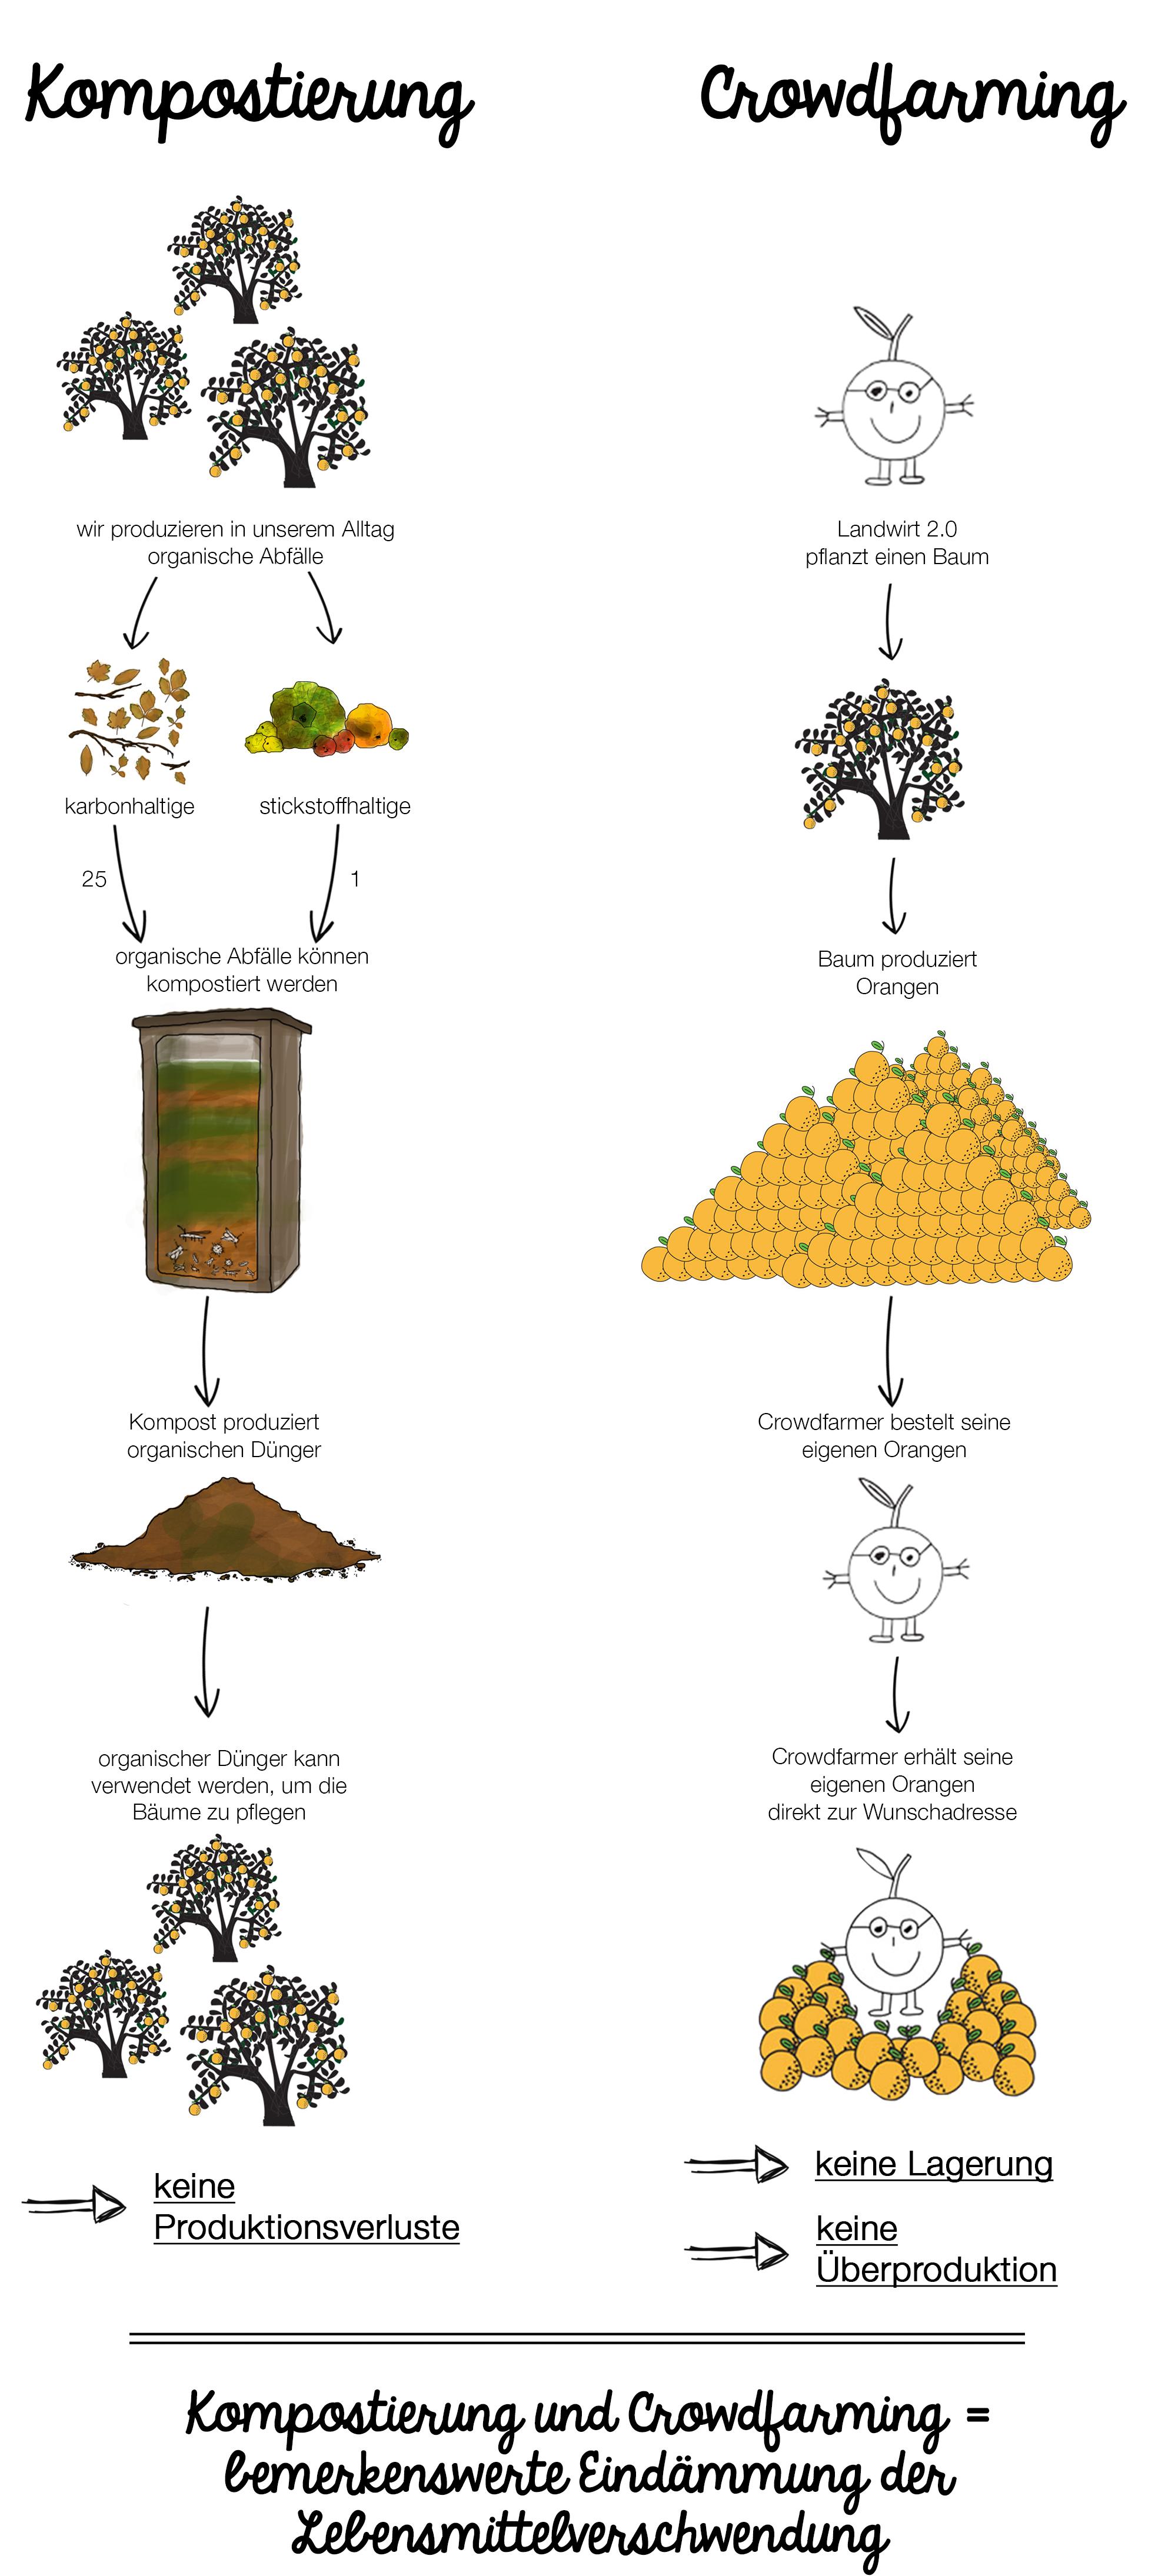 alemán_crowdfarming®+composting